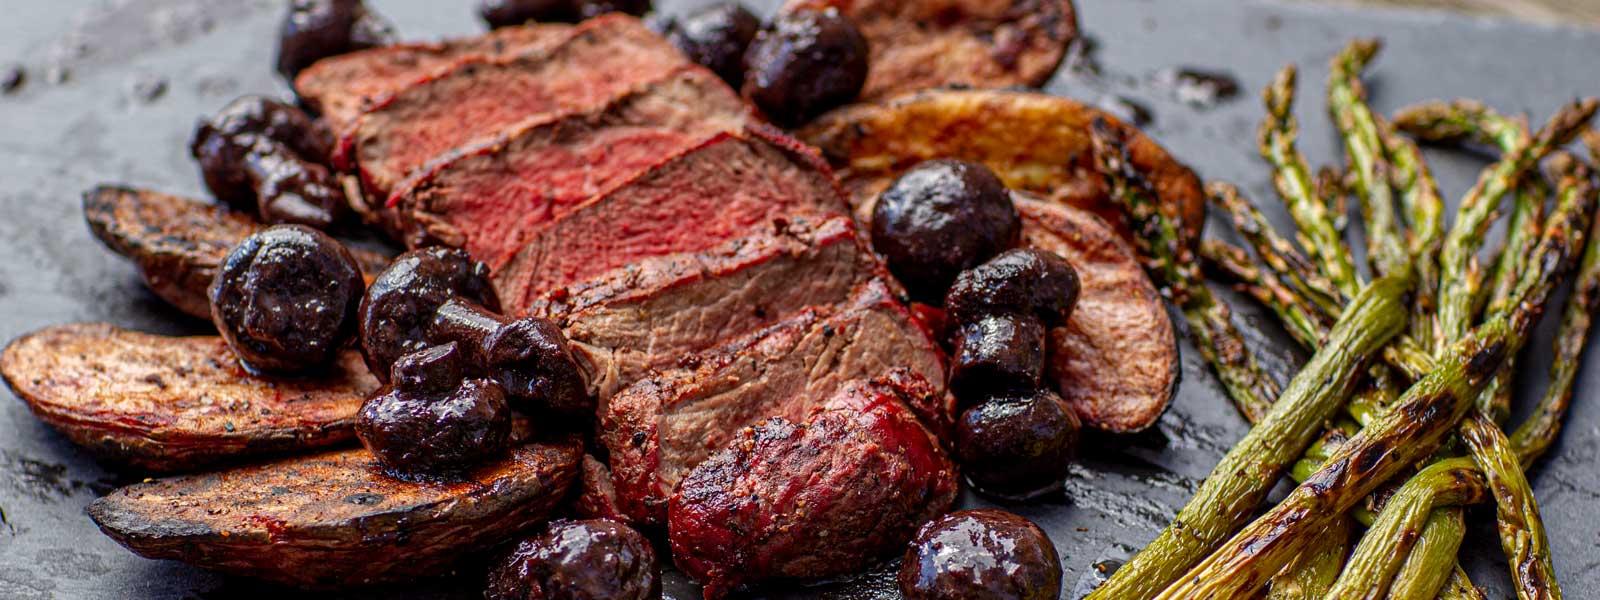 Seared Bison Filet